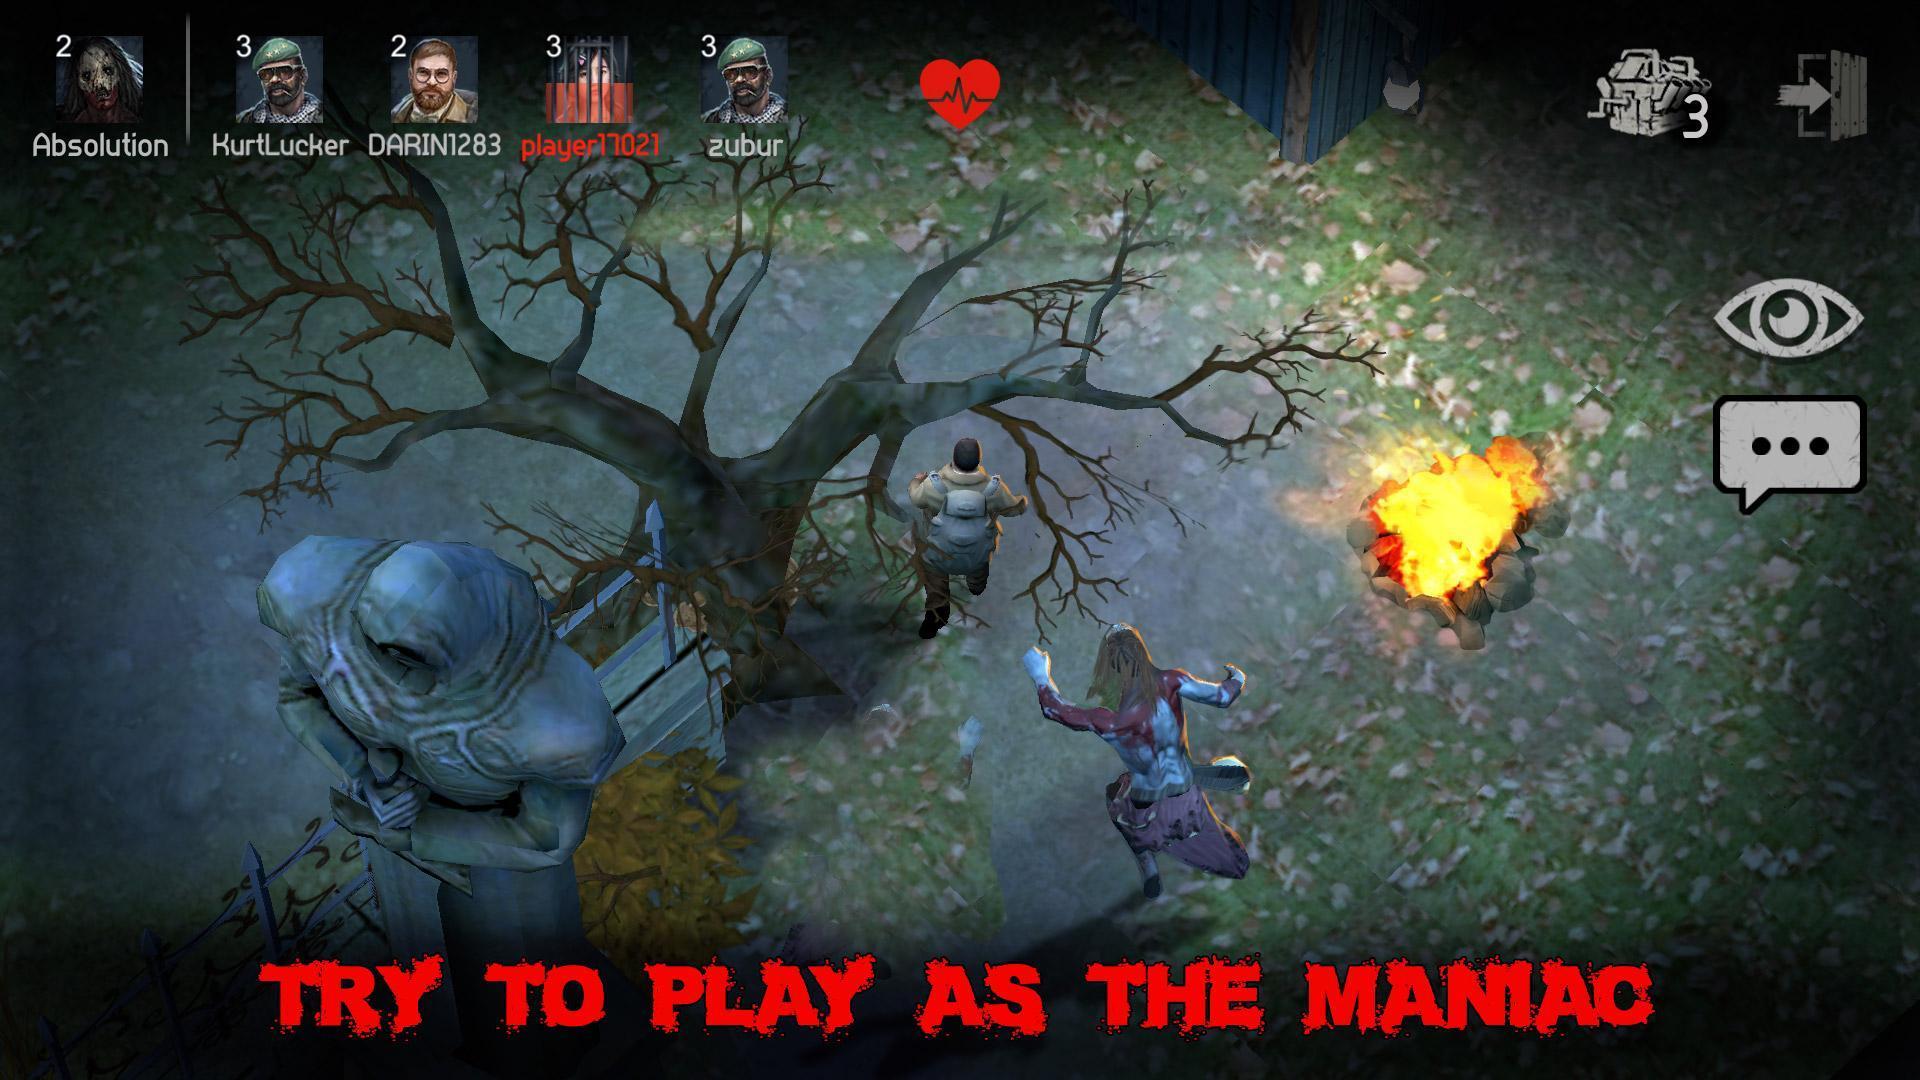 Horrorfield Multiplayer Survival Horror Game 1.3.6 Screenshot 12